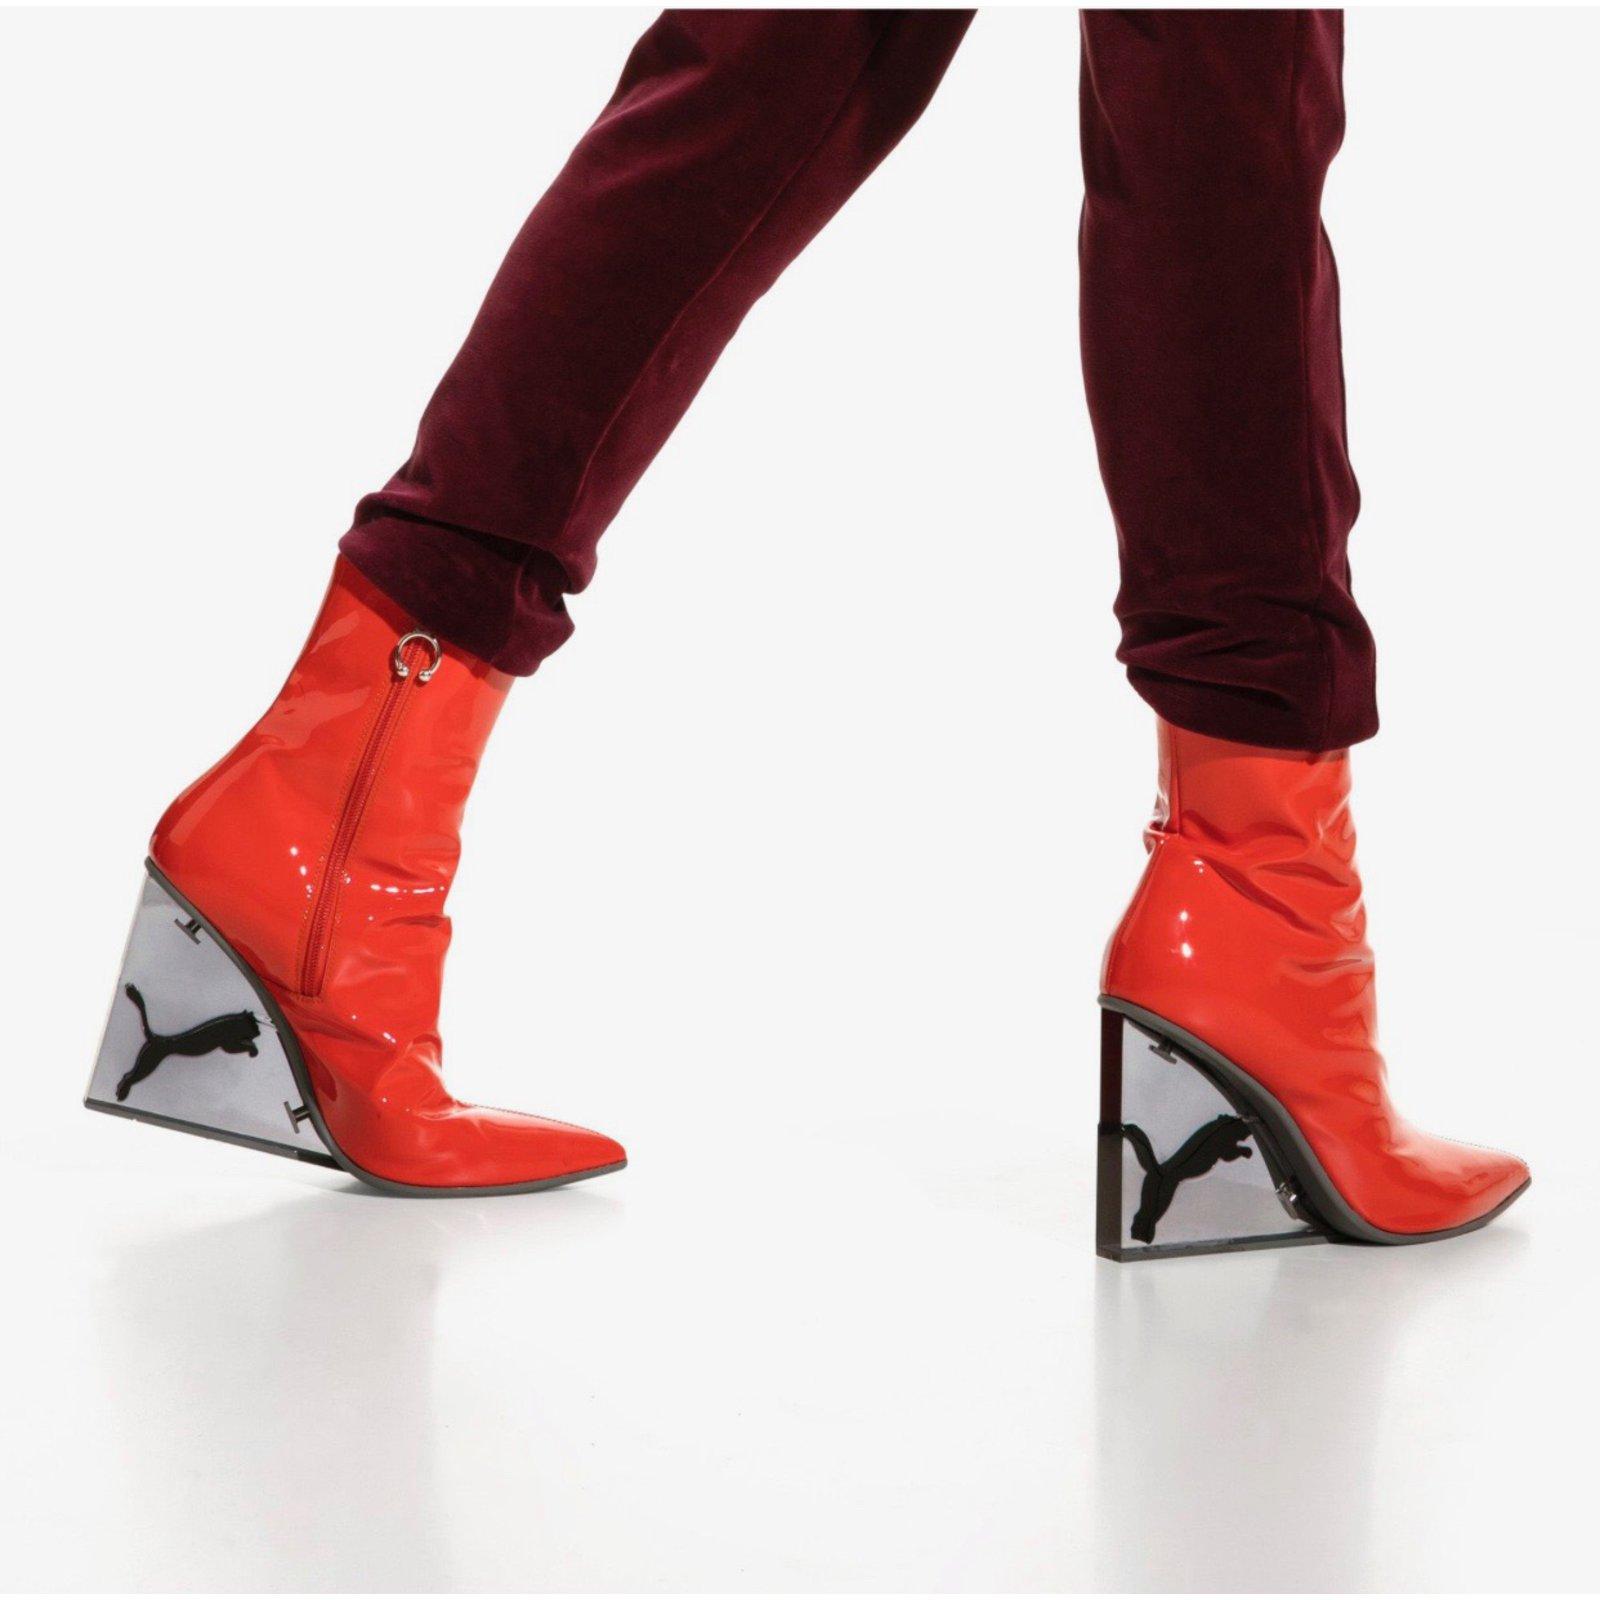 Puma Fenty By Ankle Boots Patent Leather Orange Ref75563 Maroon Joli Closet